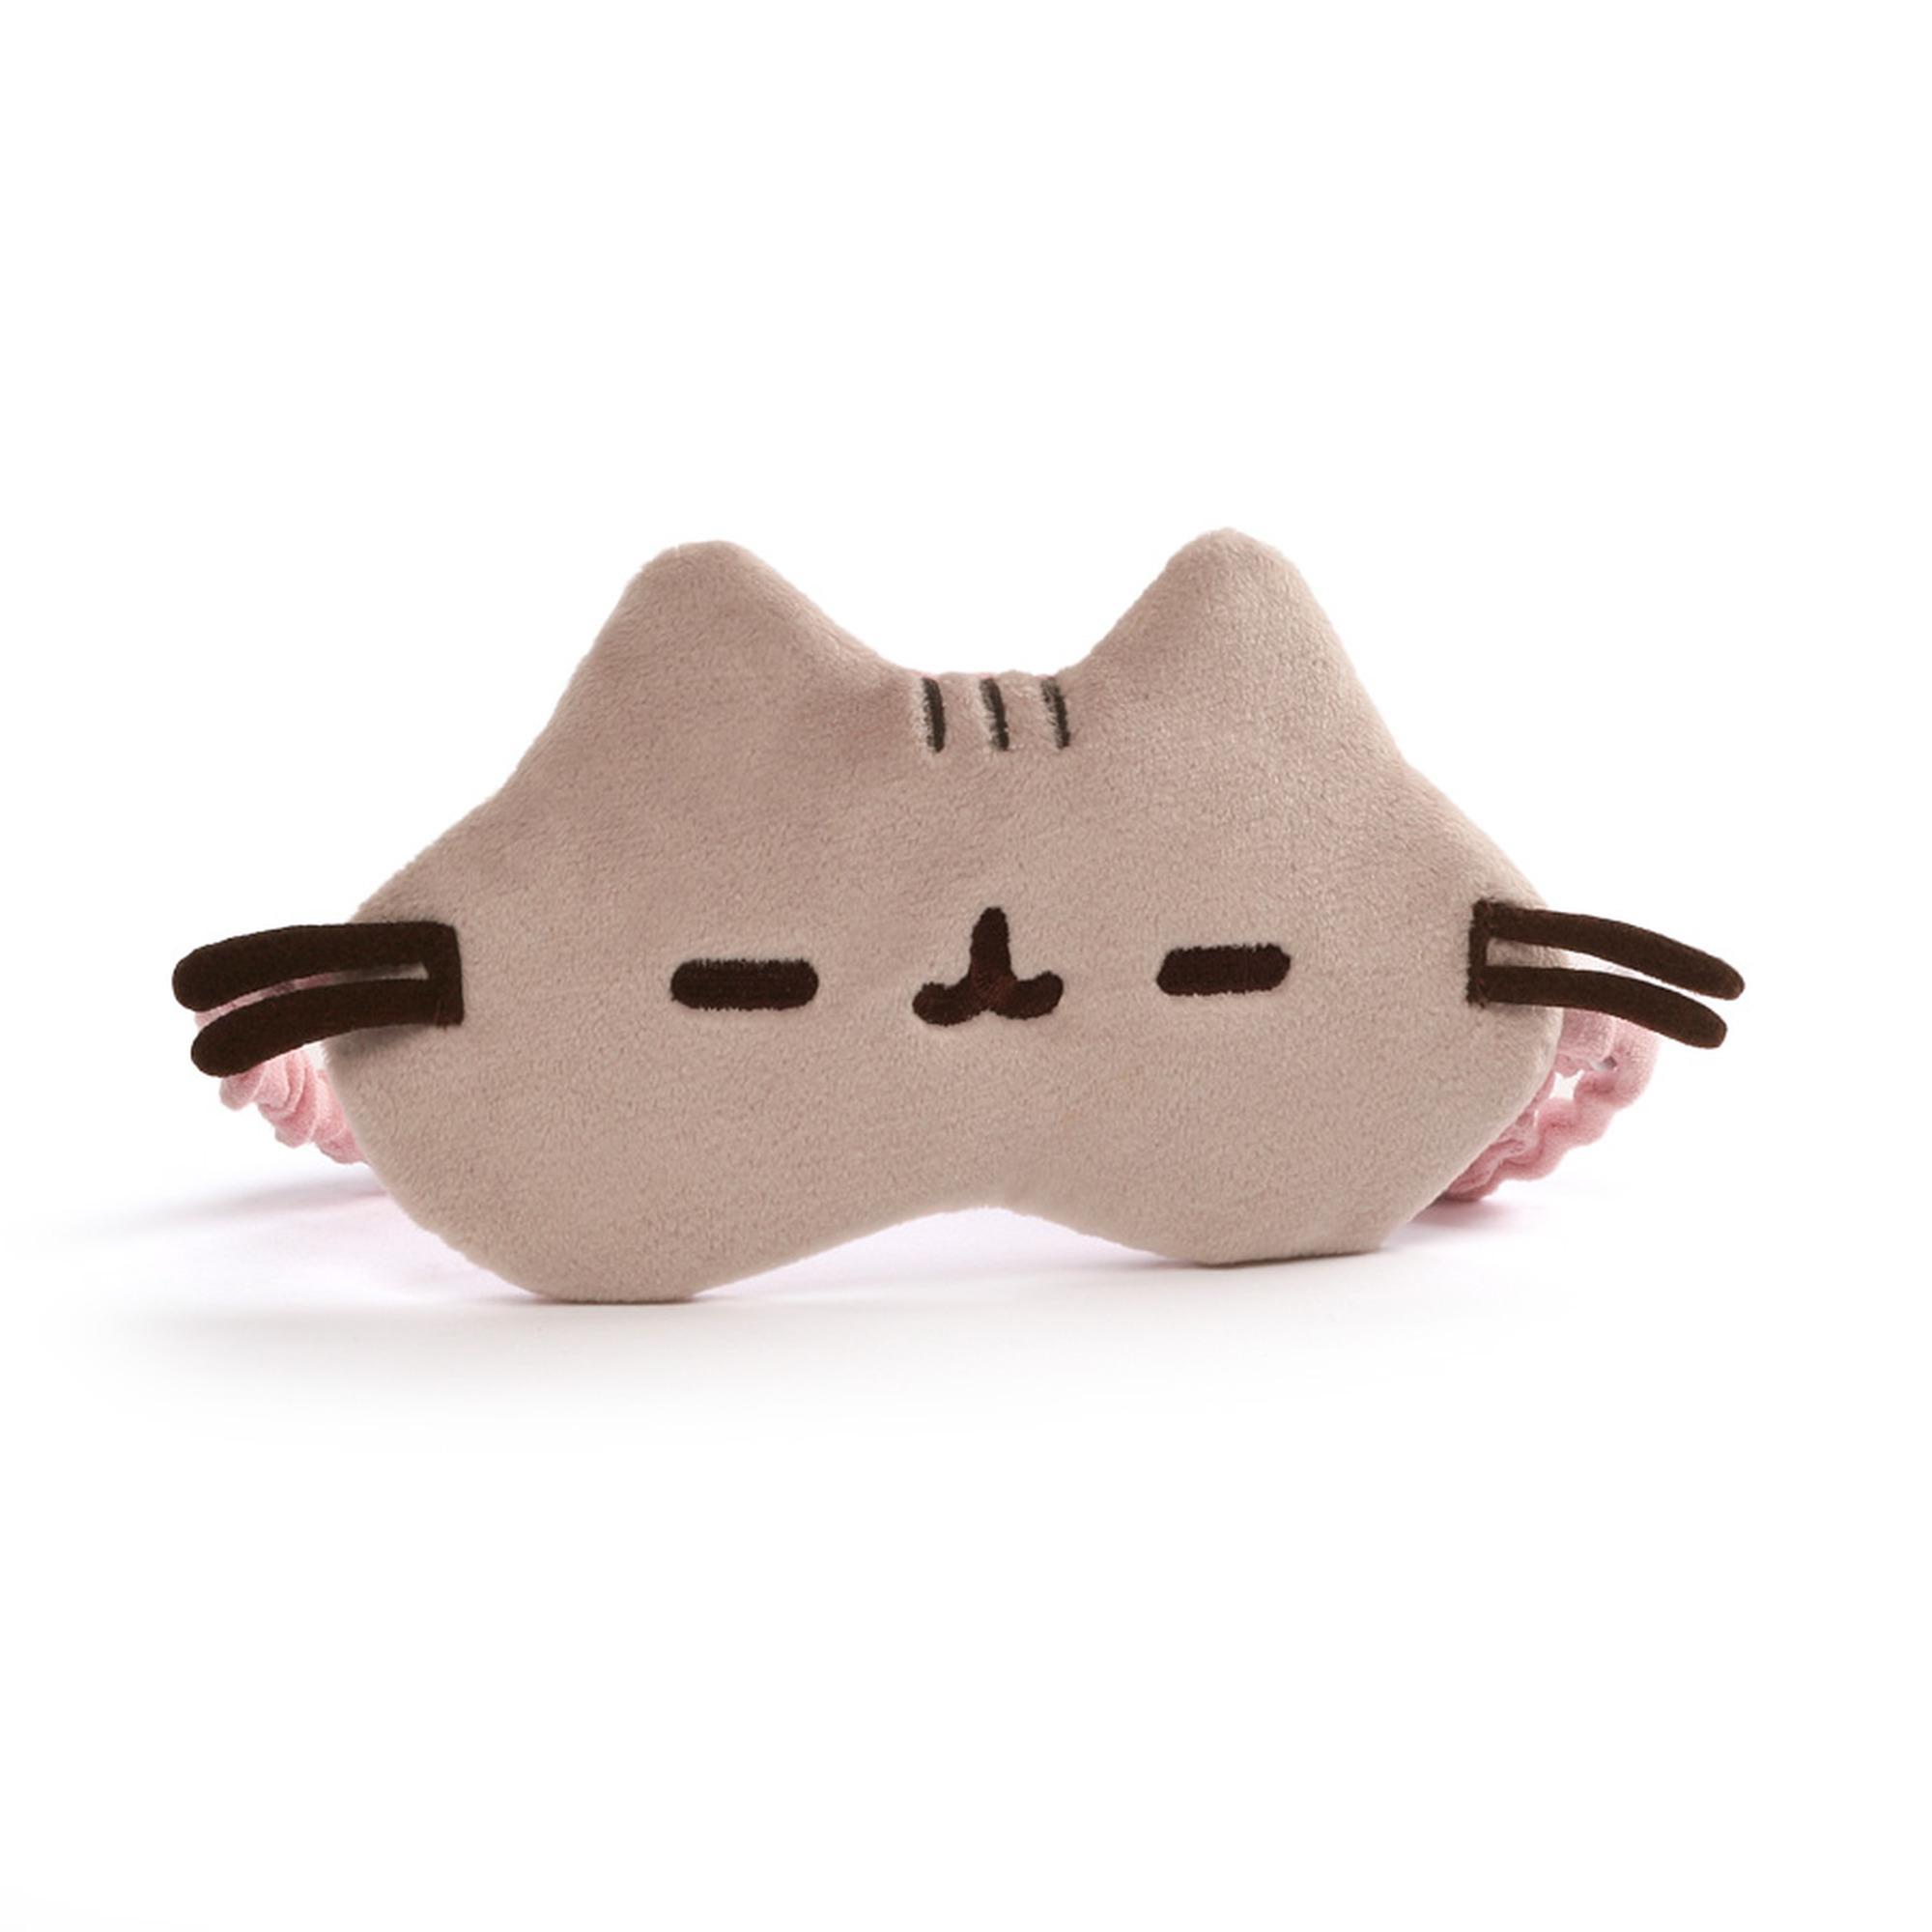 Buy Pusheen Plush Cats Stuffed Toys Gund Sushi Sleep Mask 7 Inches